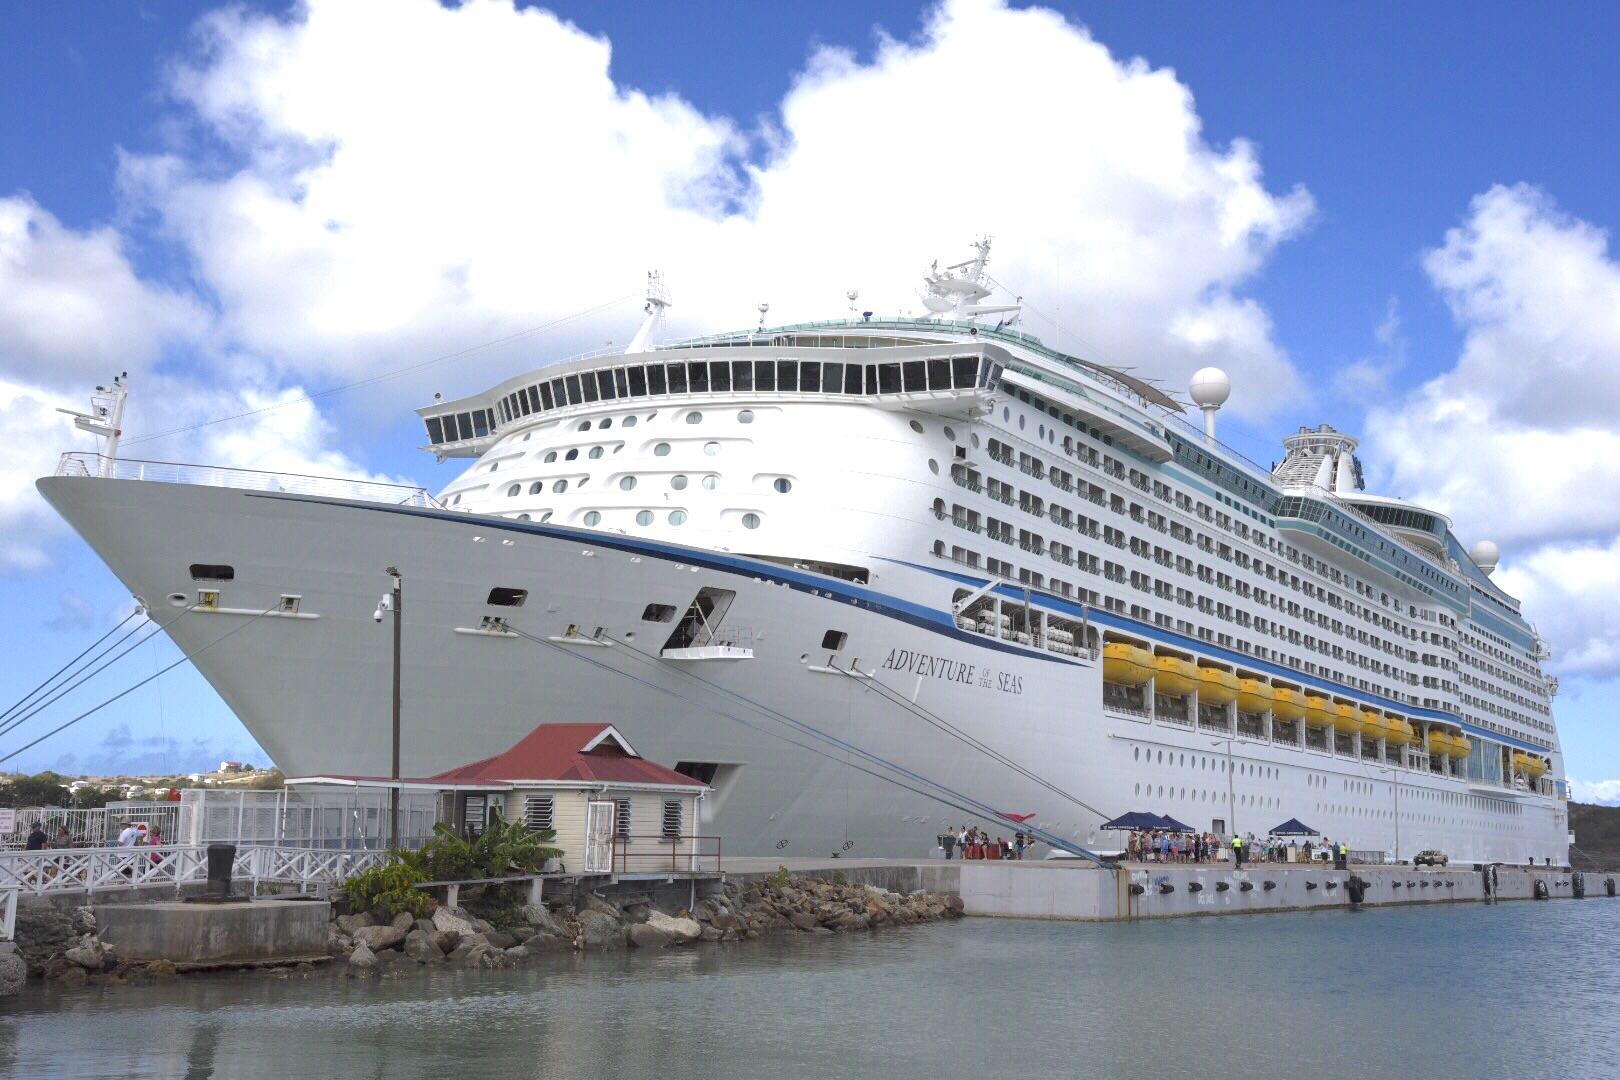 Adventure of the Seas in St John